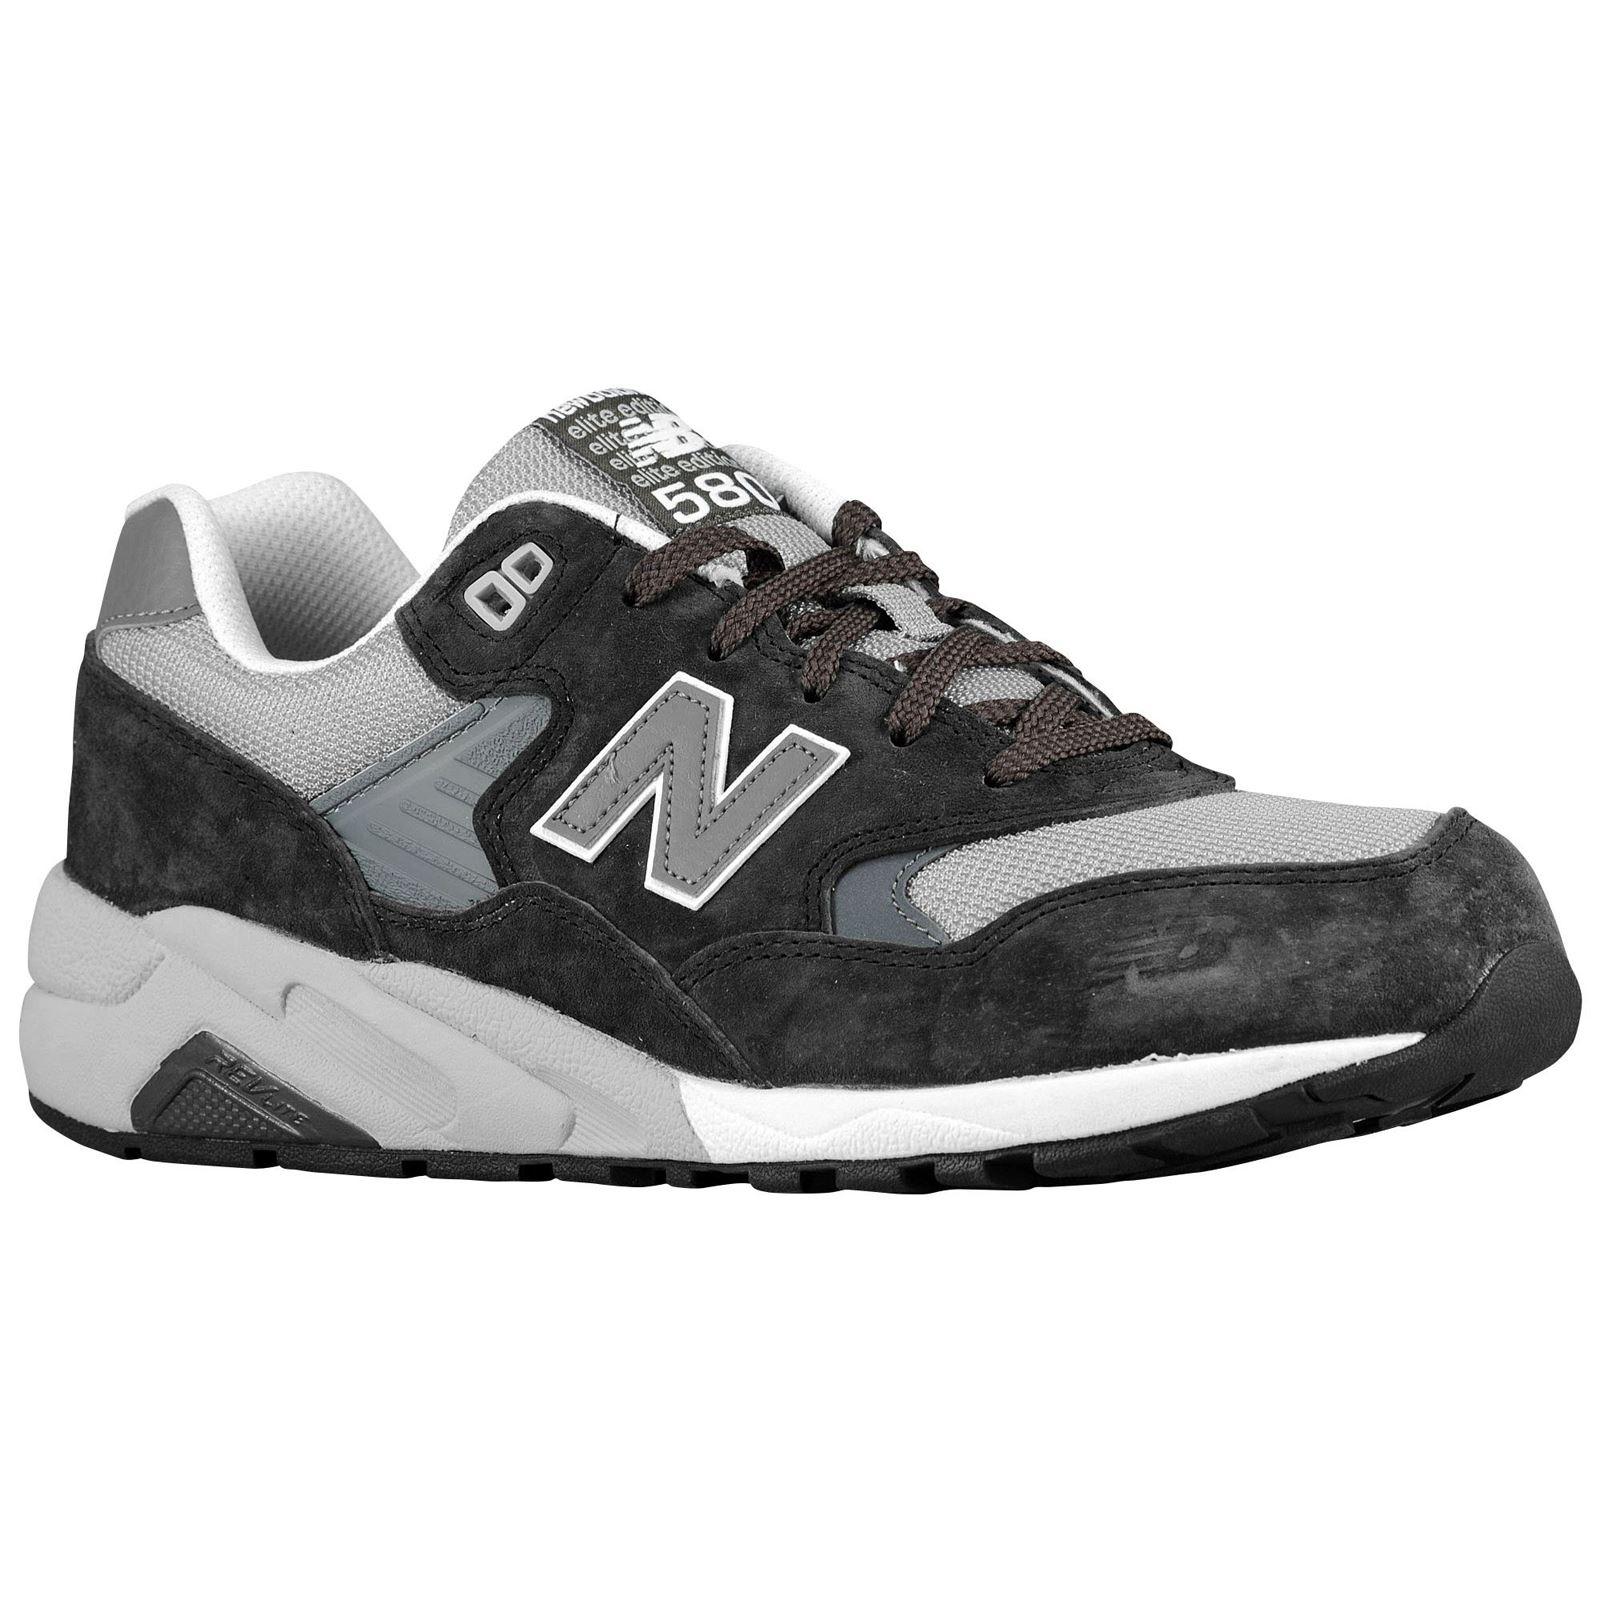 supra chaussure homme - New Balance Lifestyle Mode de Vie Vert Baskets Pour Homme MRT580GR ...